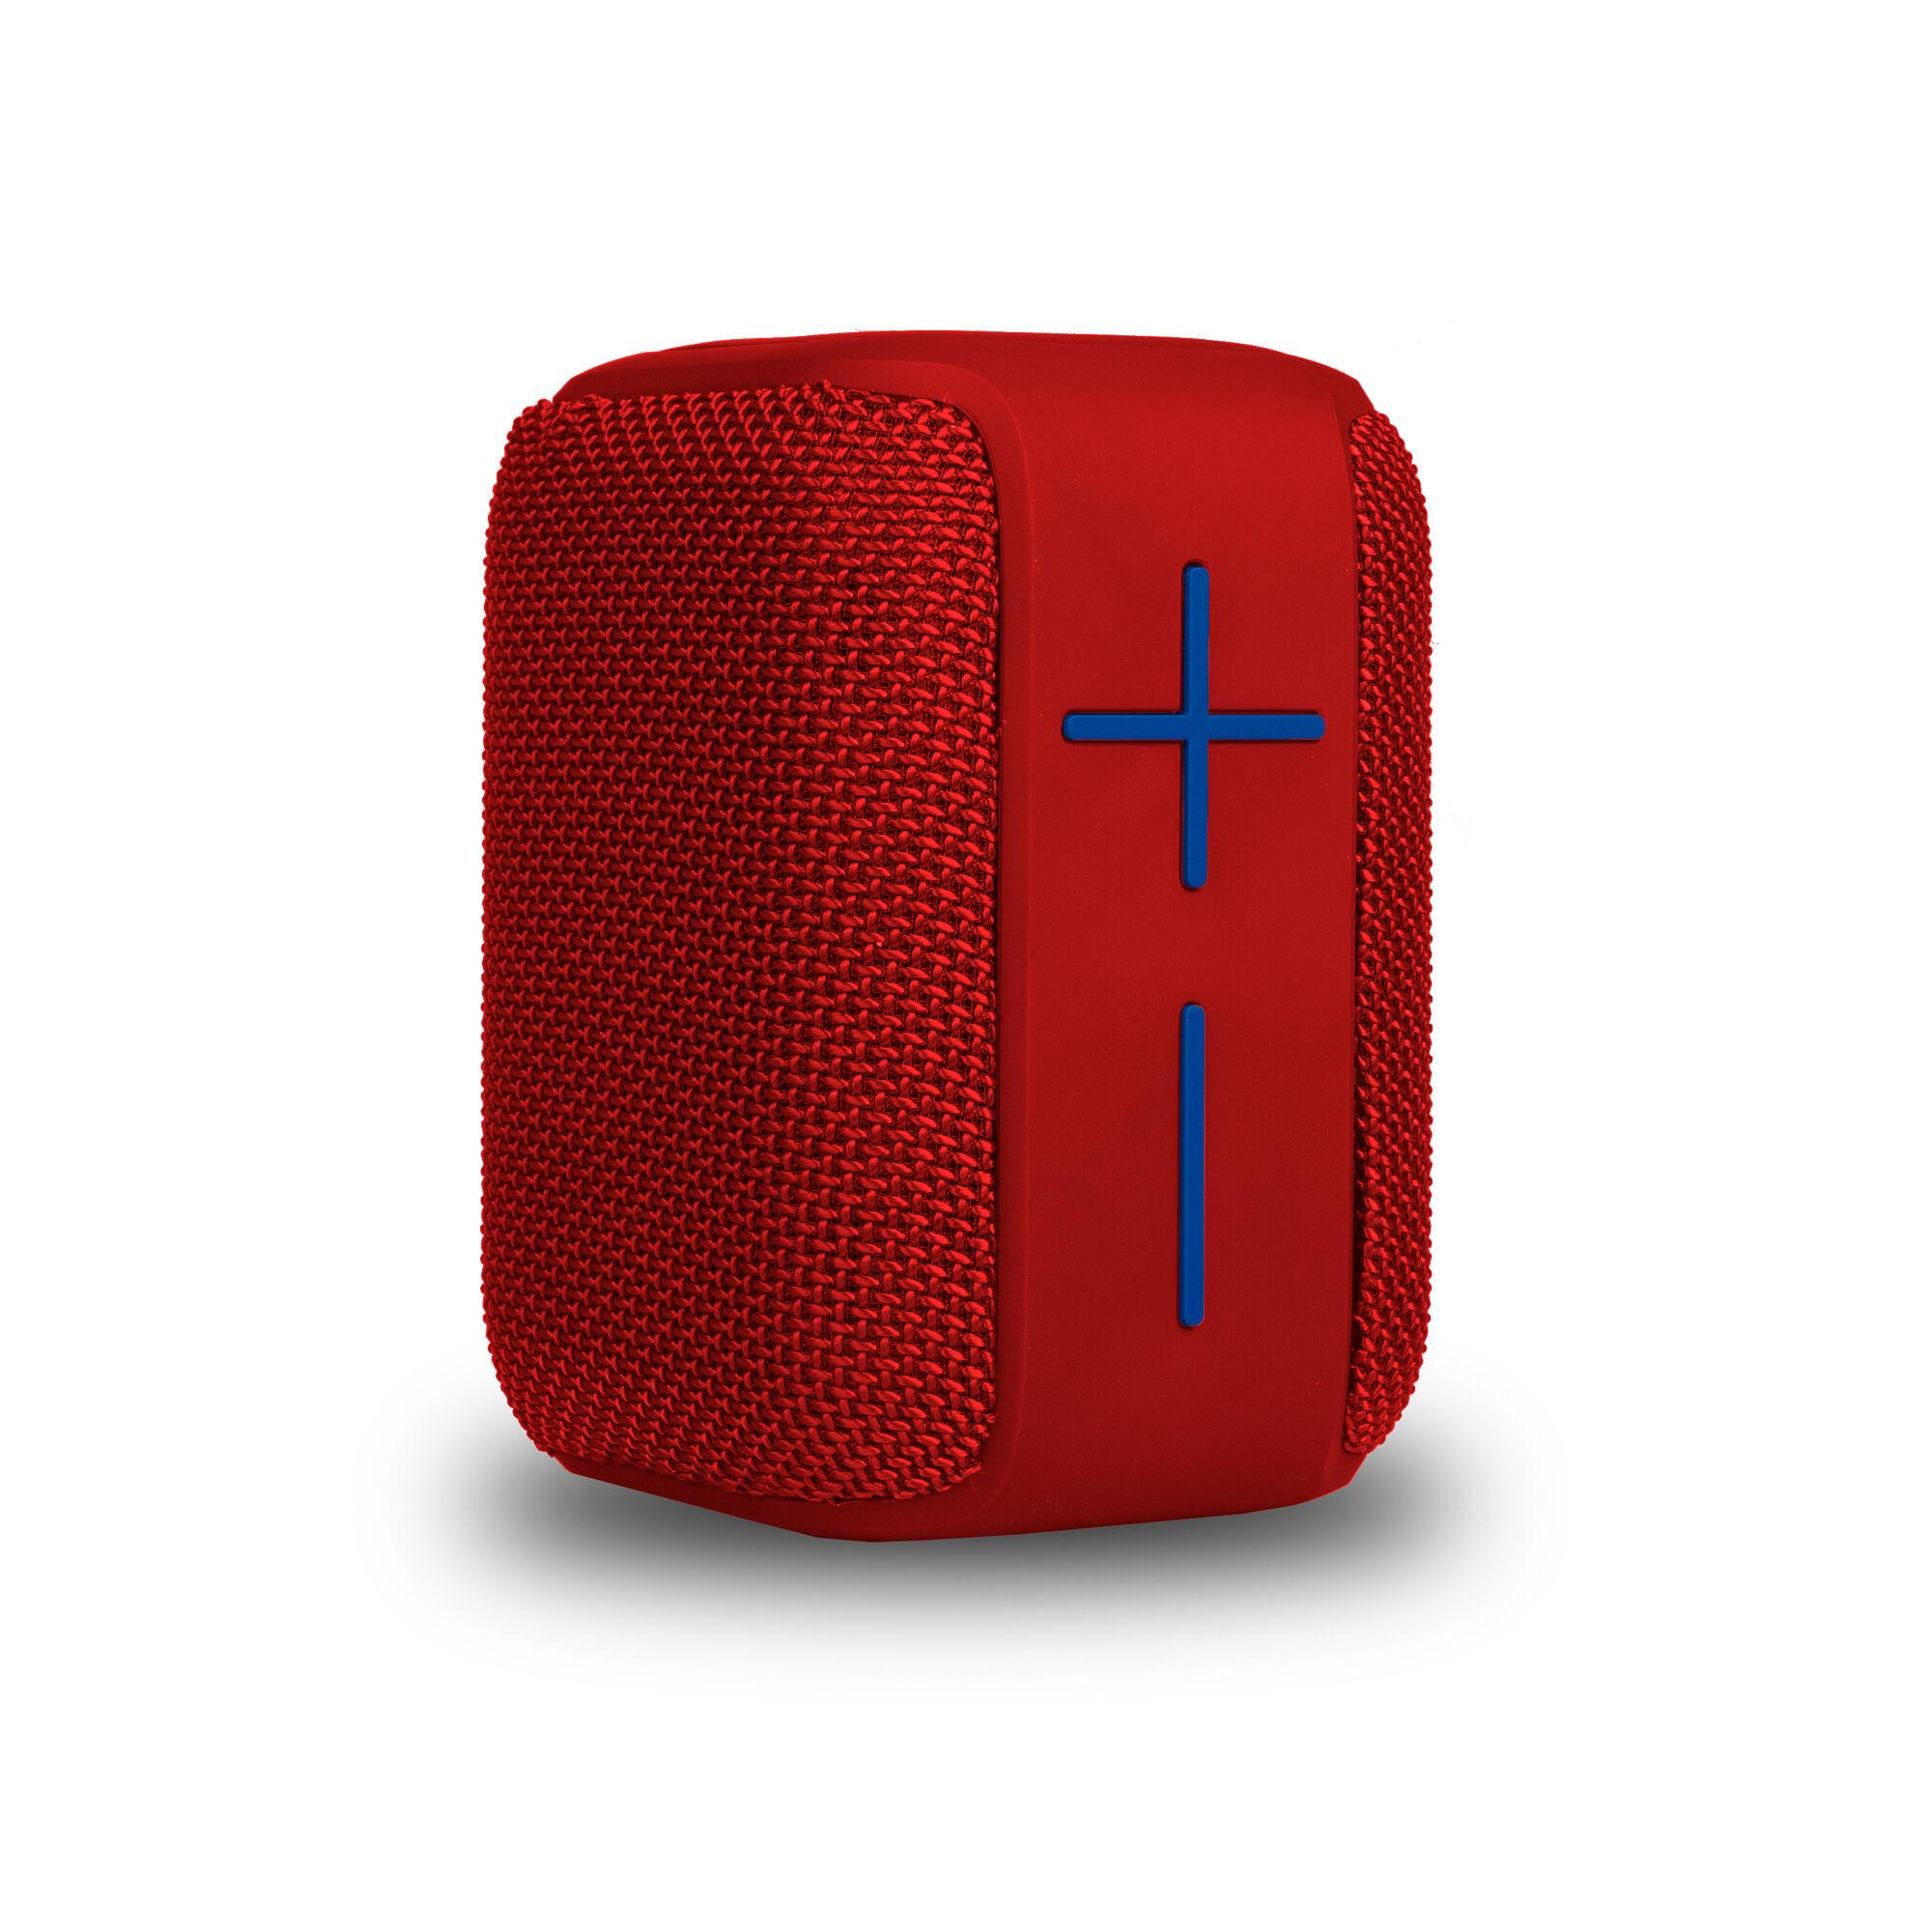 NGS 10W Wireless BT Speaker, Roller Coaster - Red